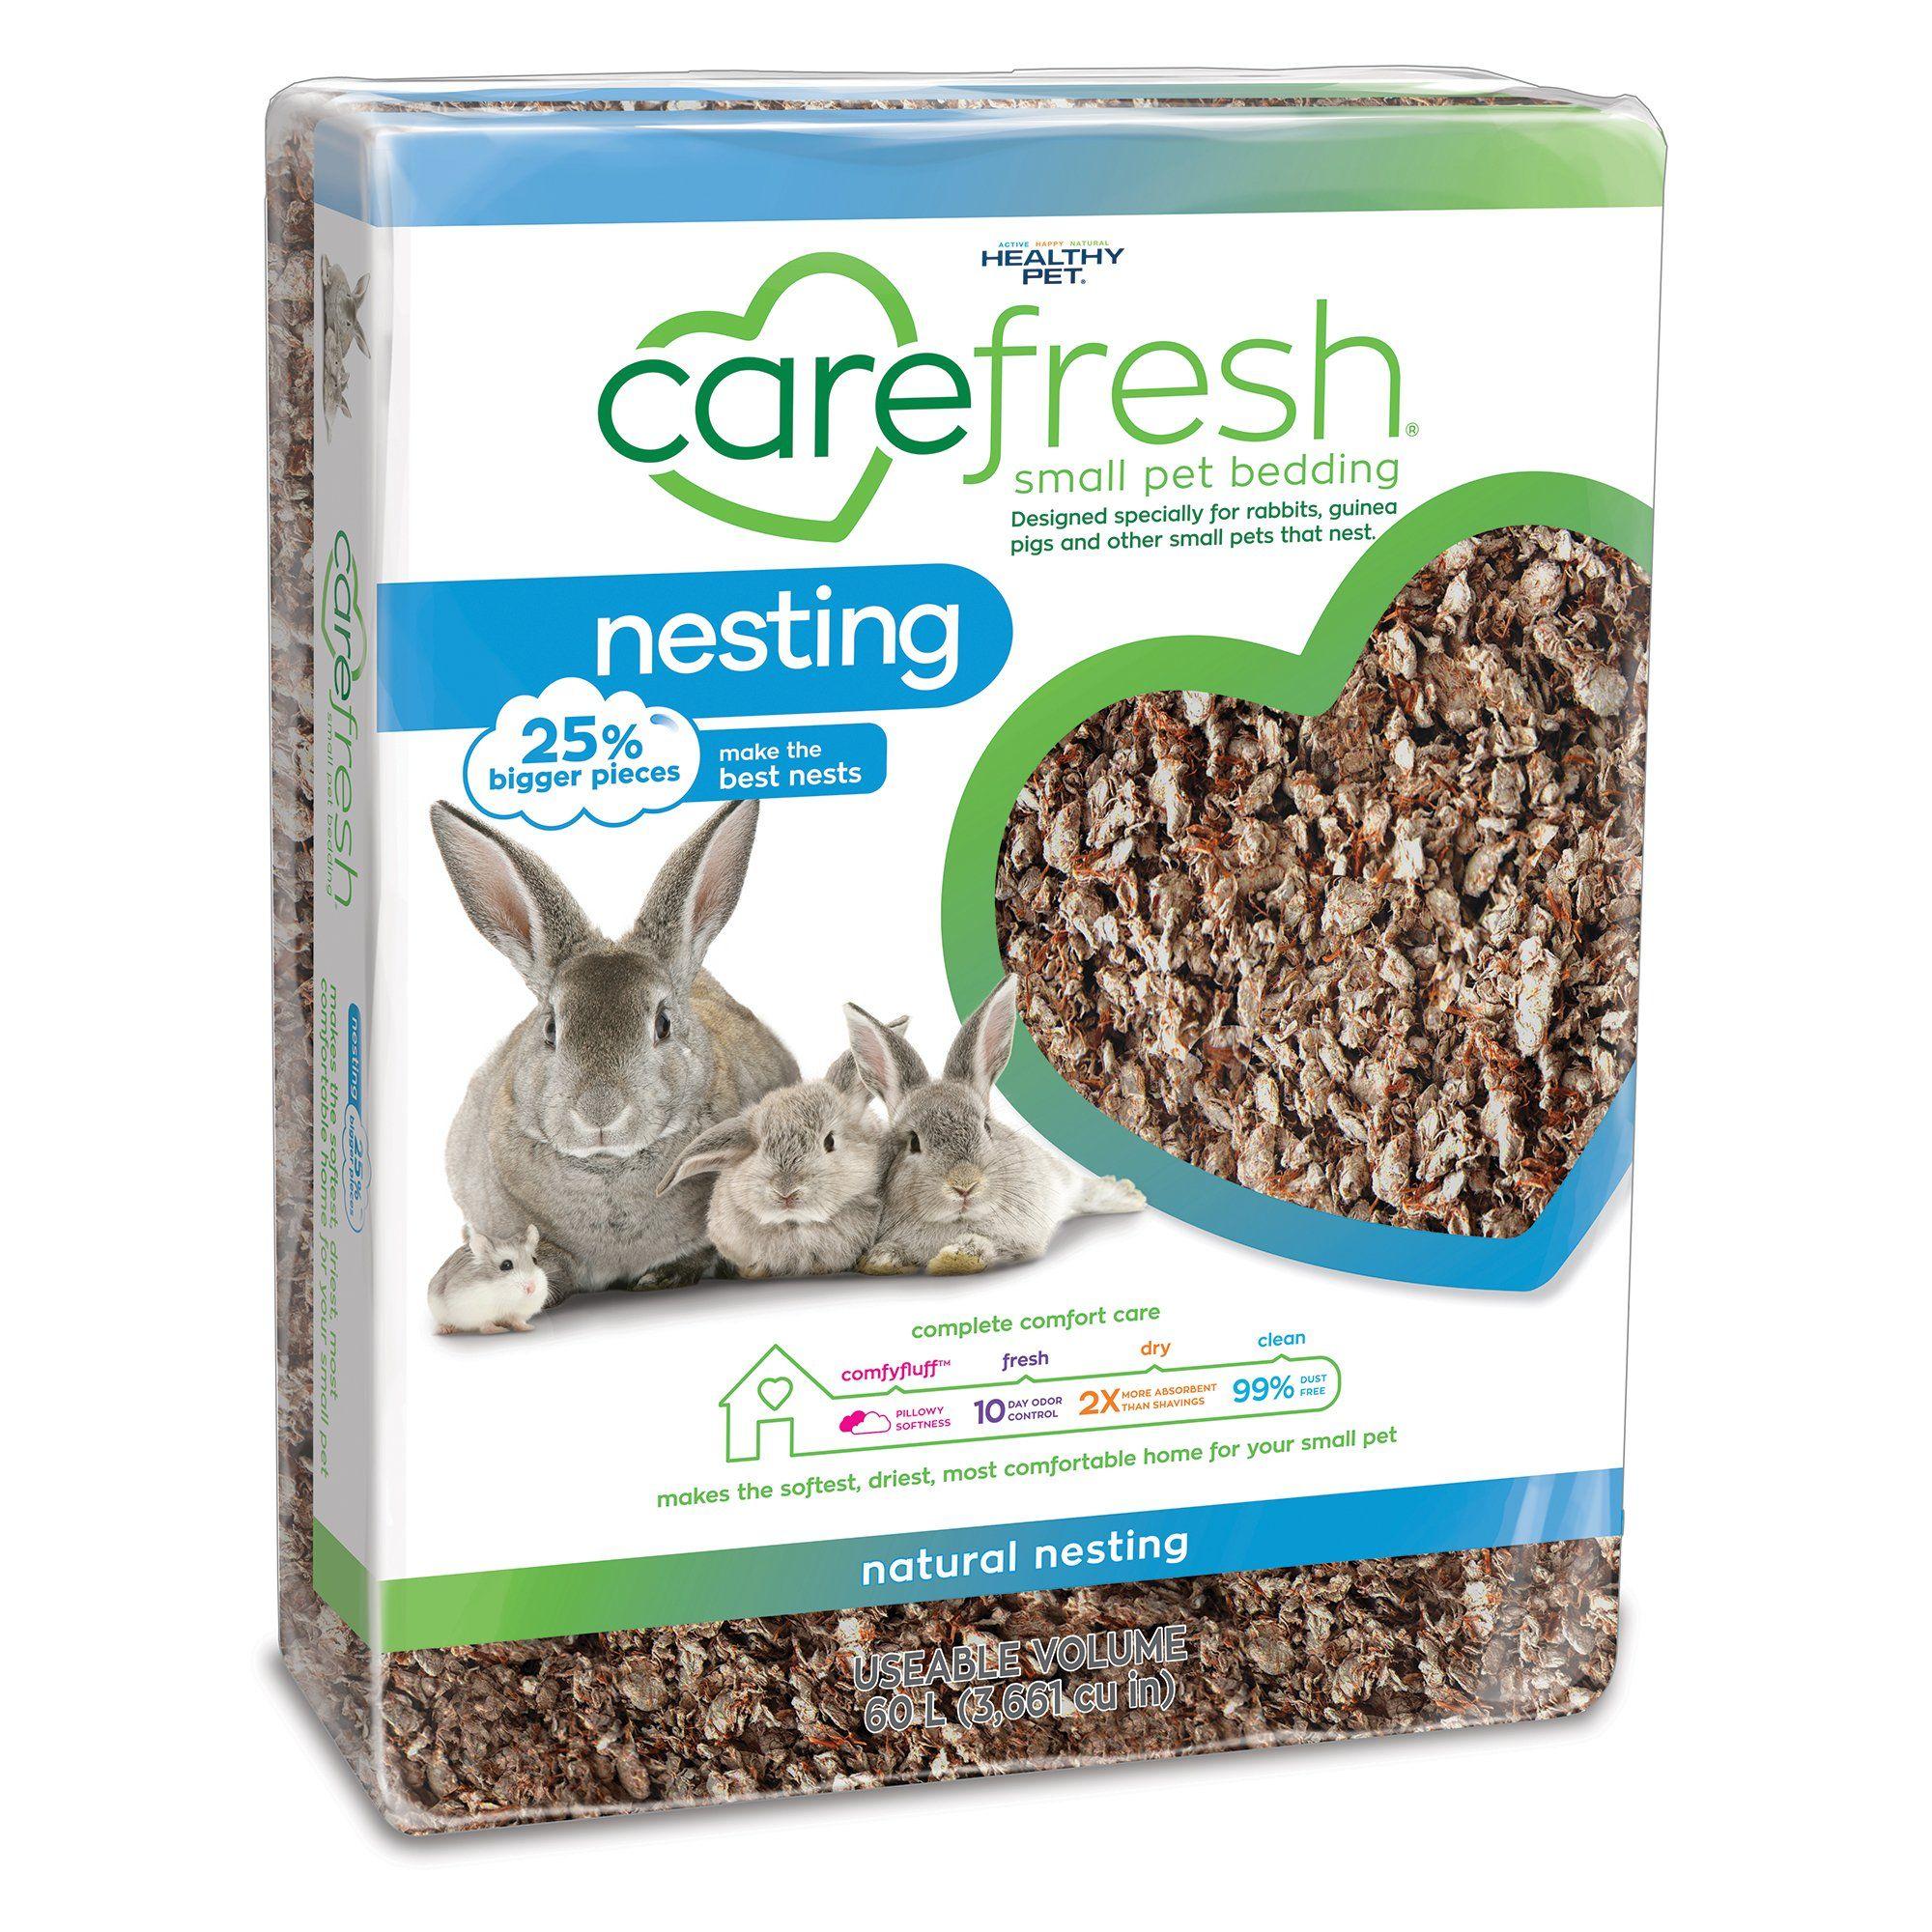 Carefresh Natural Nesting, 60 Liter Petco in 2020